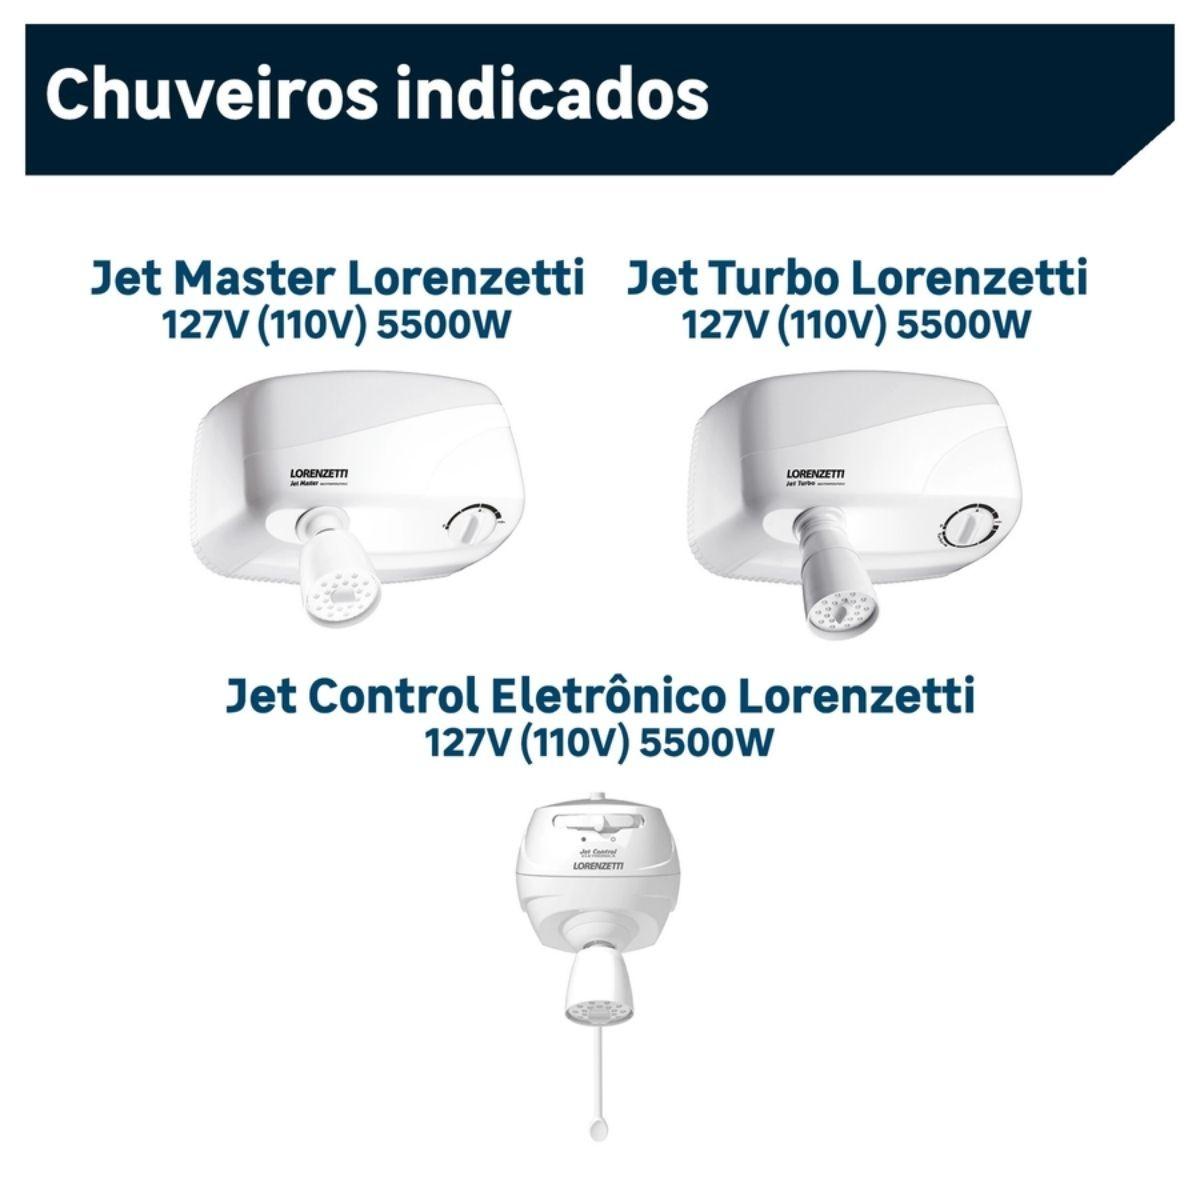 Resistência Jet Control Eletrônica / Jet Turbo 127V 5500W Lorenzetti Original